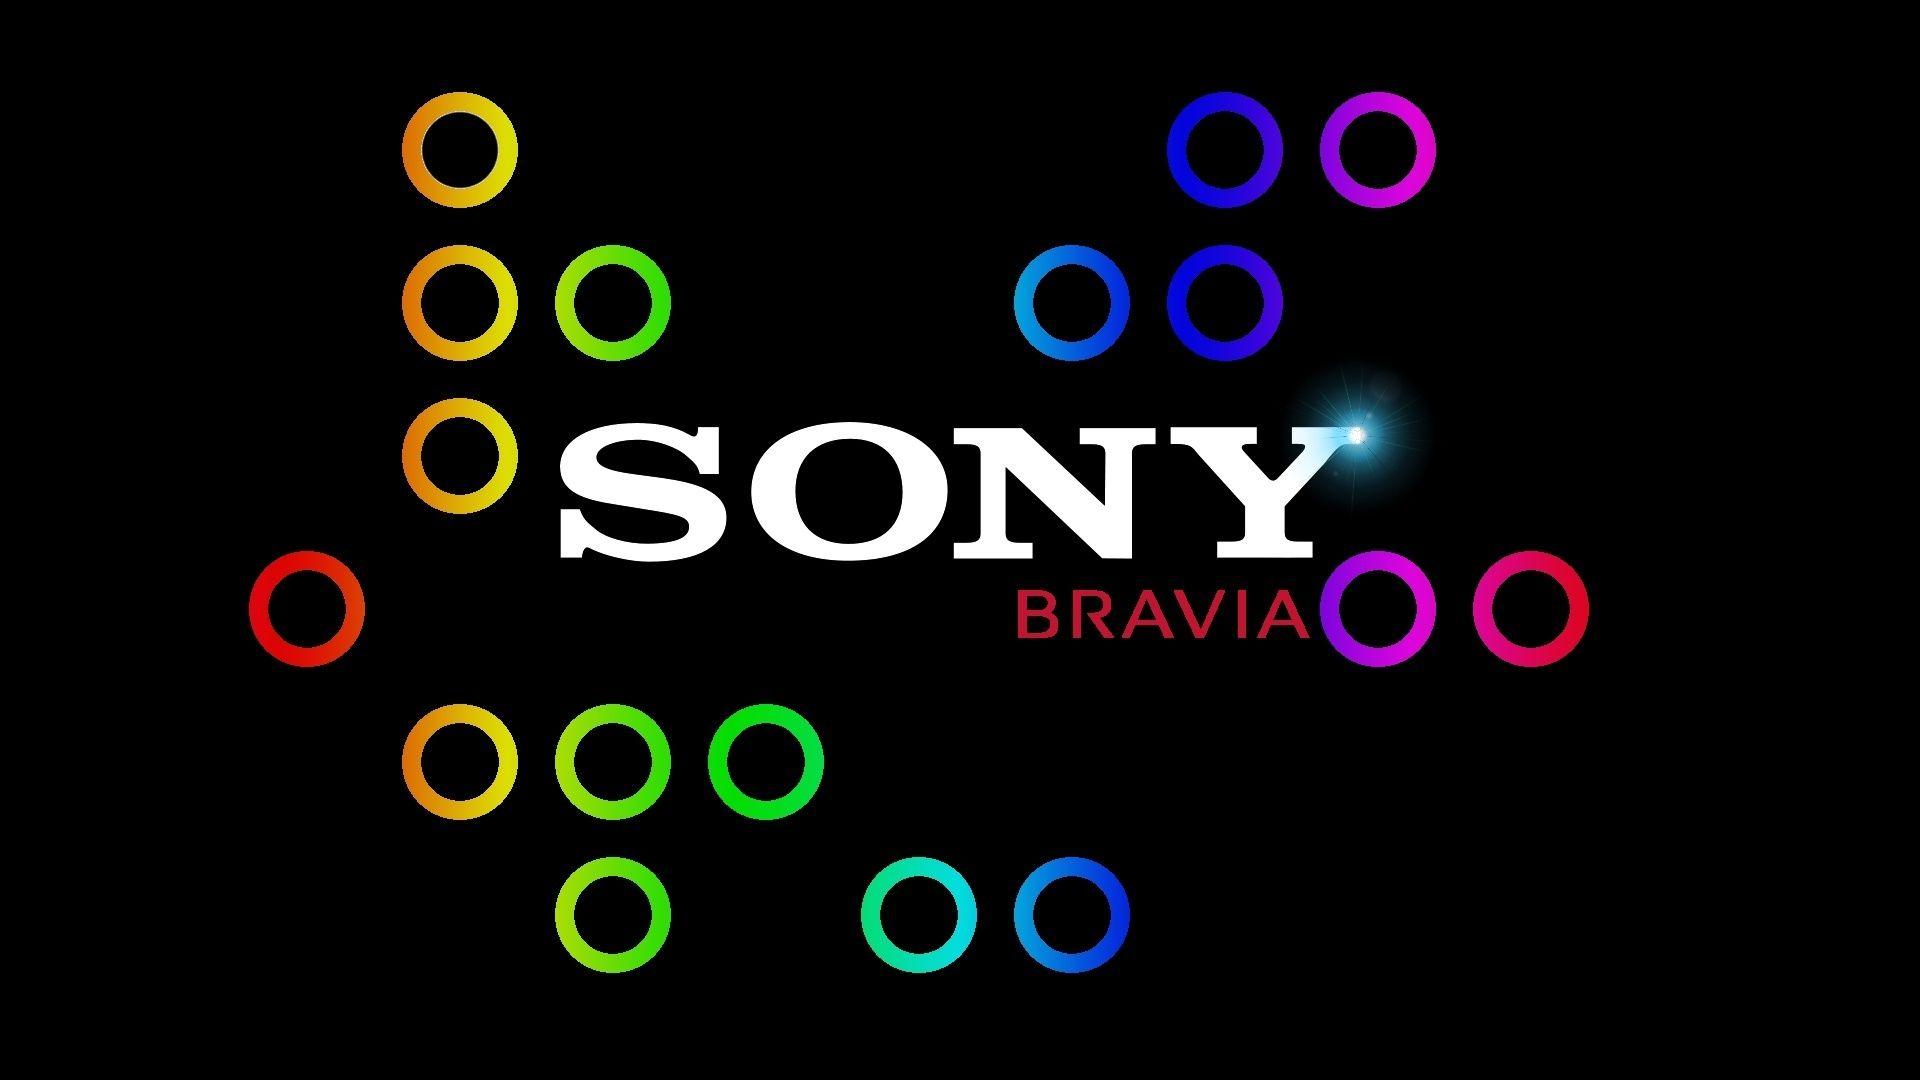 105ae4cd25ce31b65a5120ba00a674bf Sony Boost BRAVIA 4K Home Automation